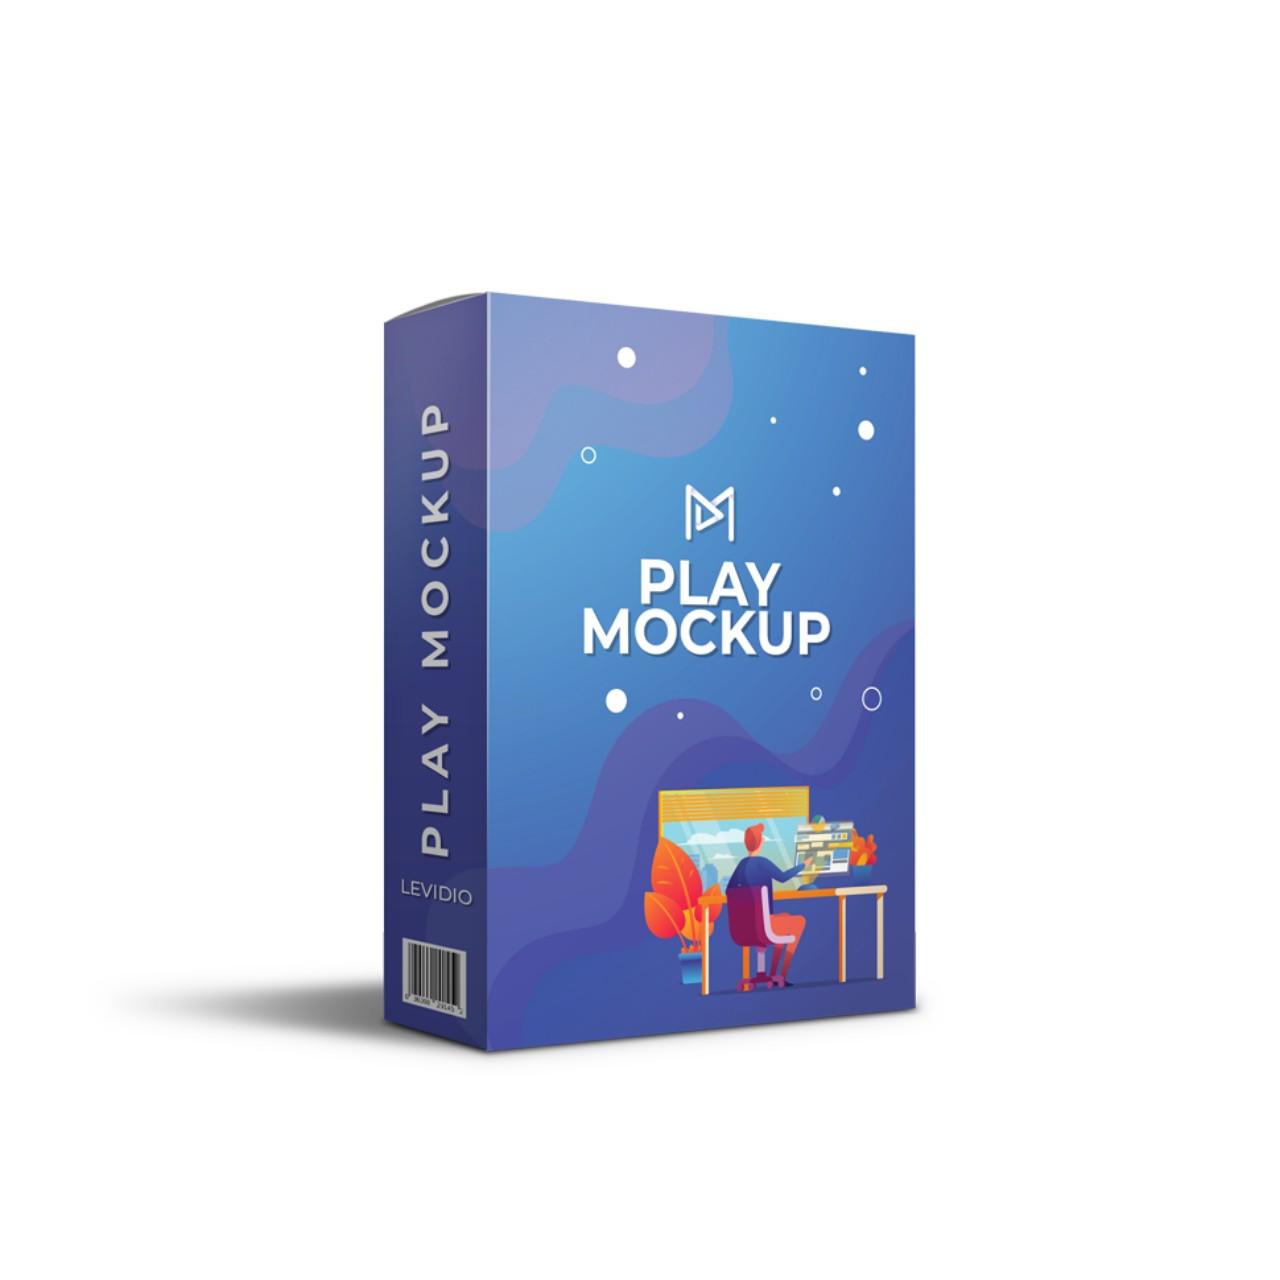 Levidio PlayMockup Pro